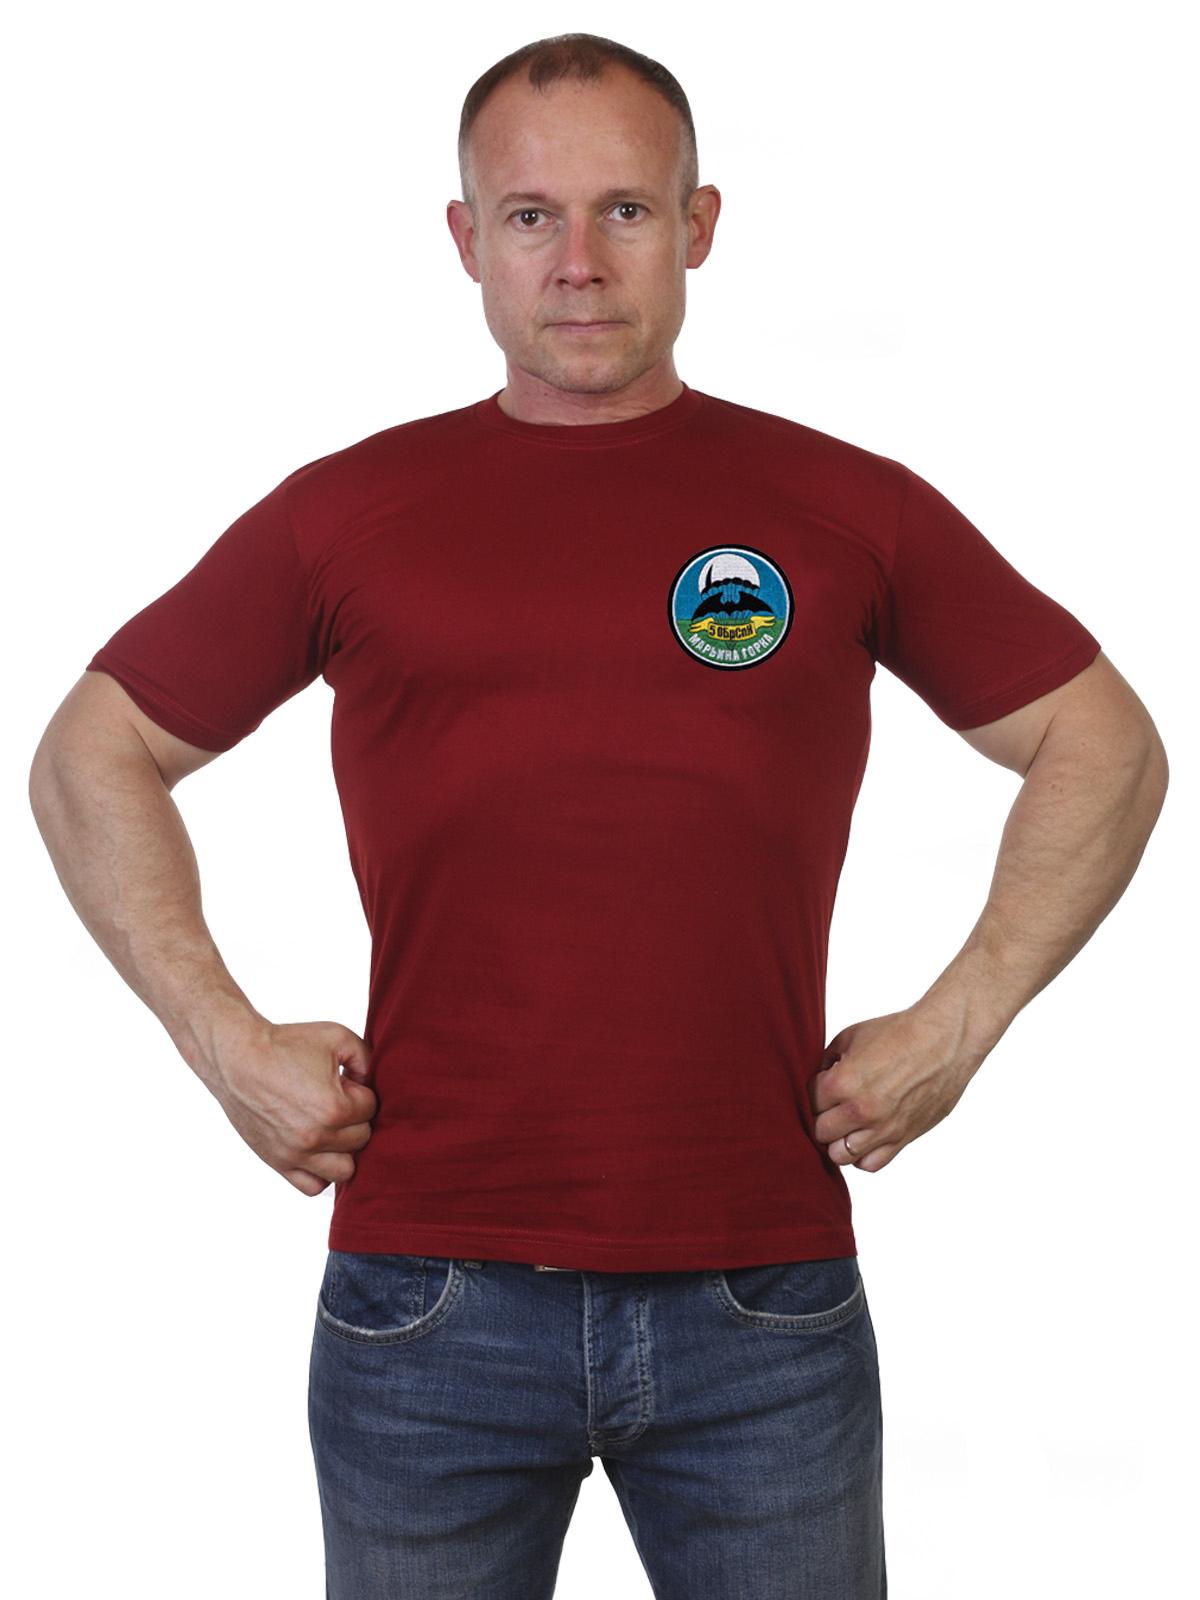 Мужская футболка 5 ОБрСпН